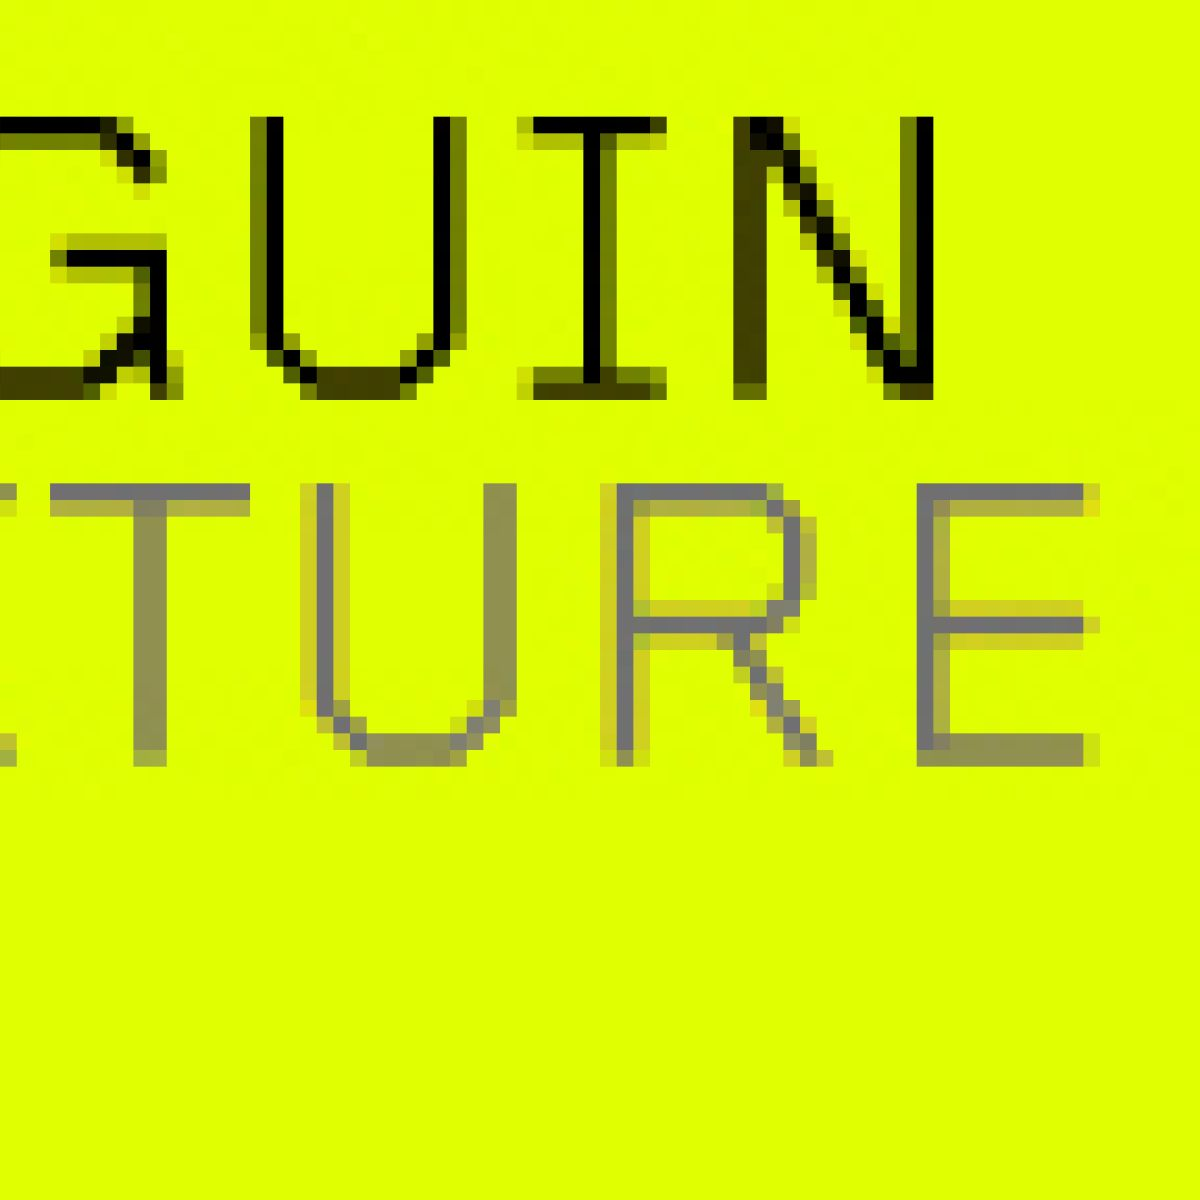 Galerie Patrick Seguin 20th Century Furniture & Architecture